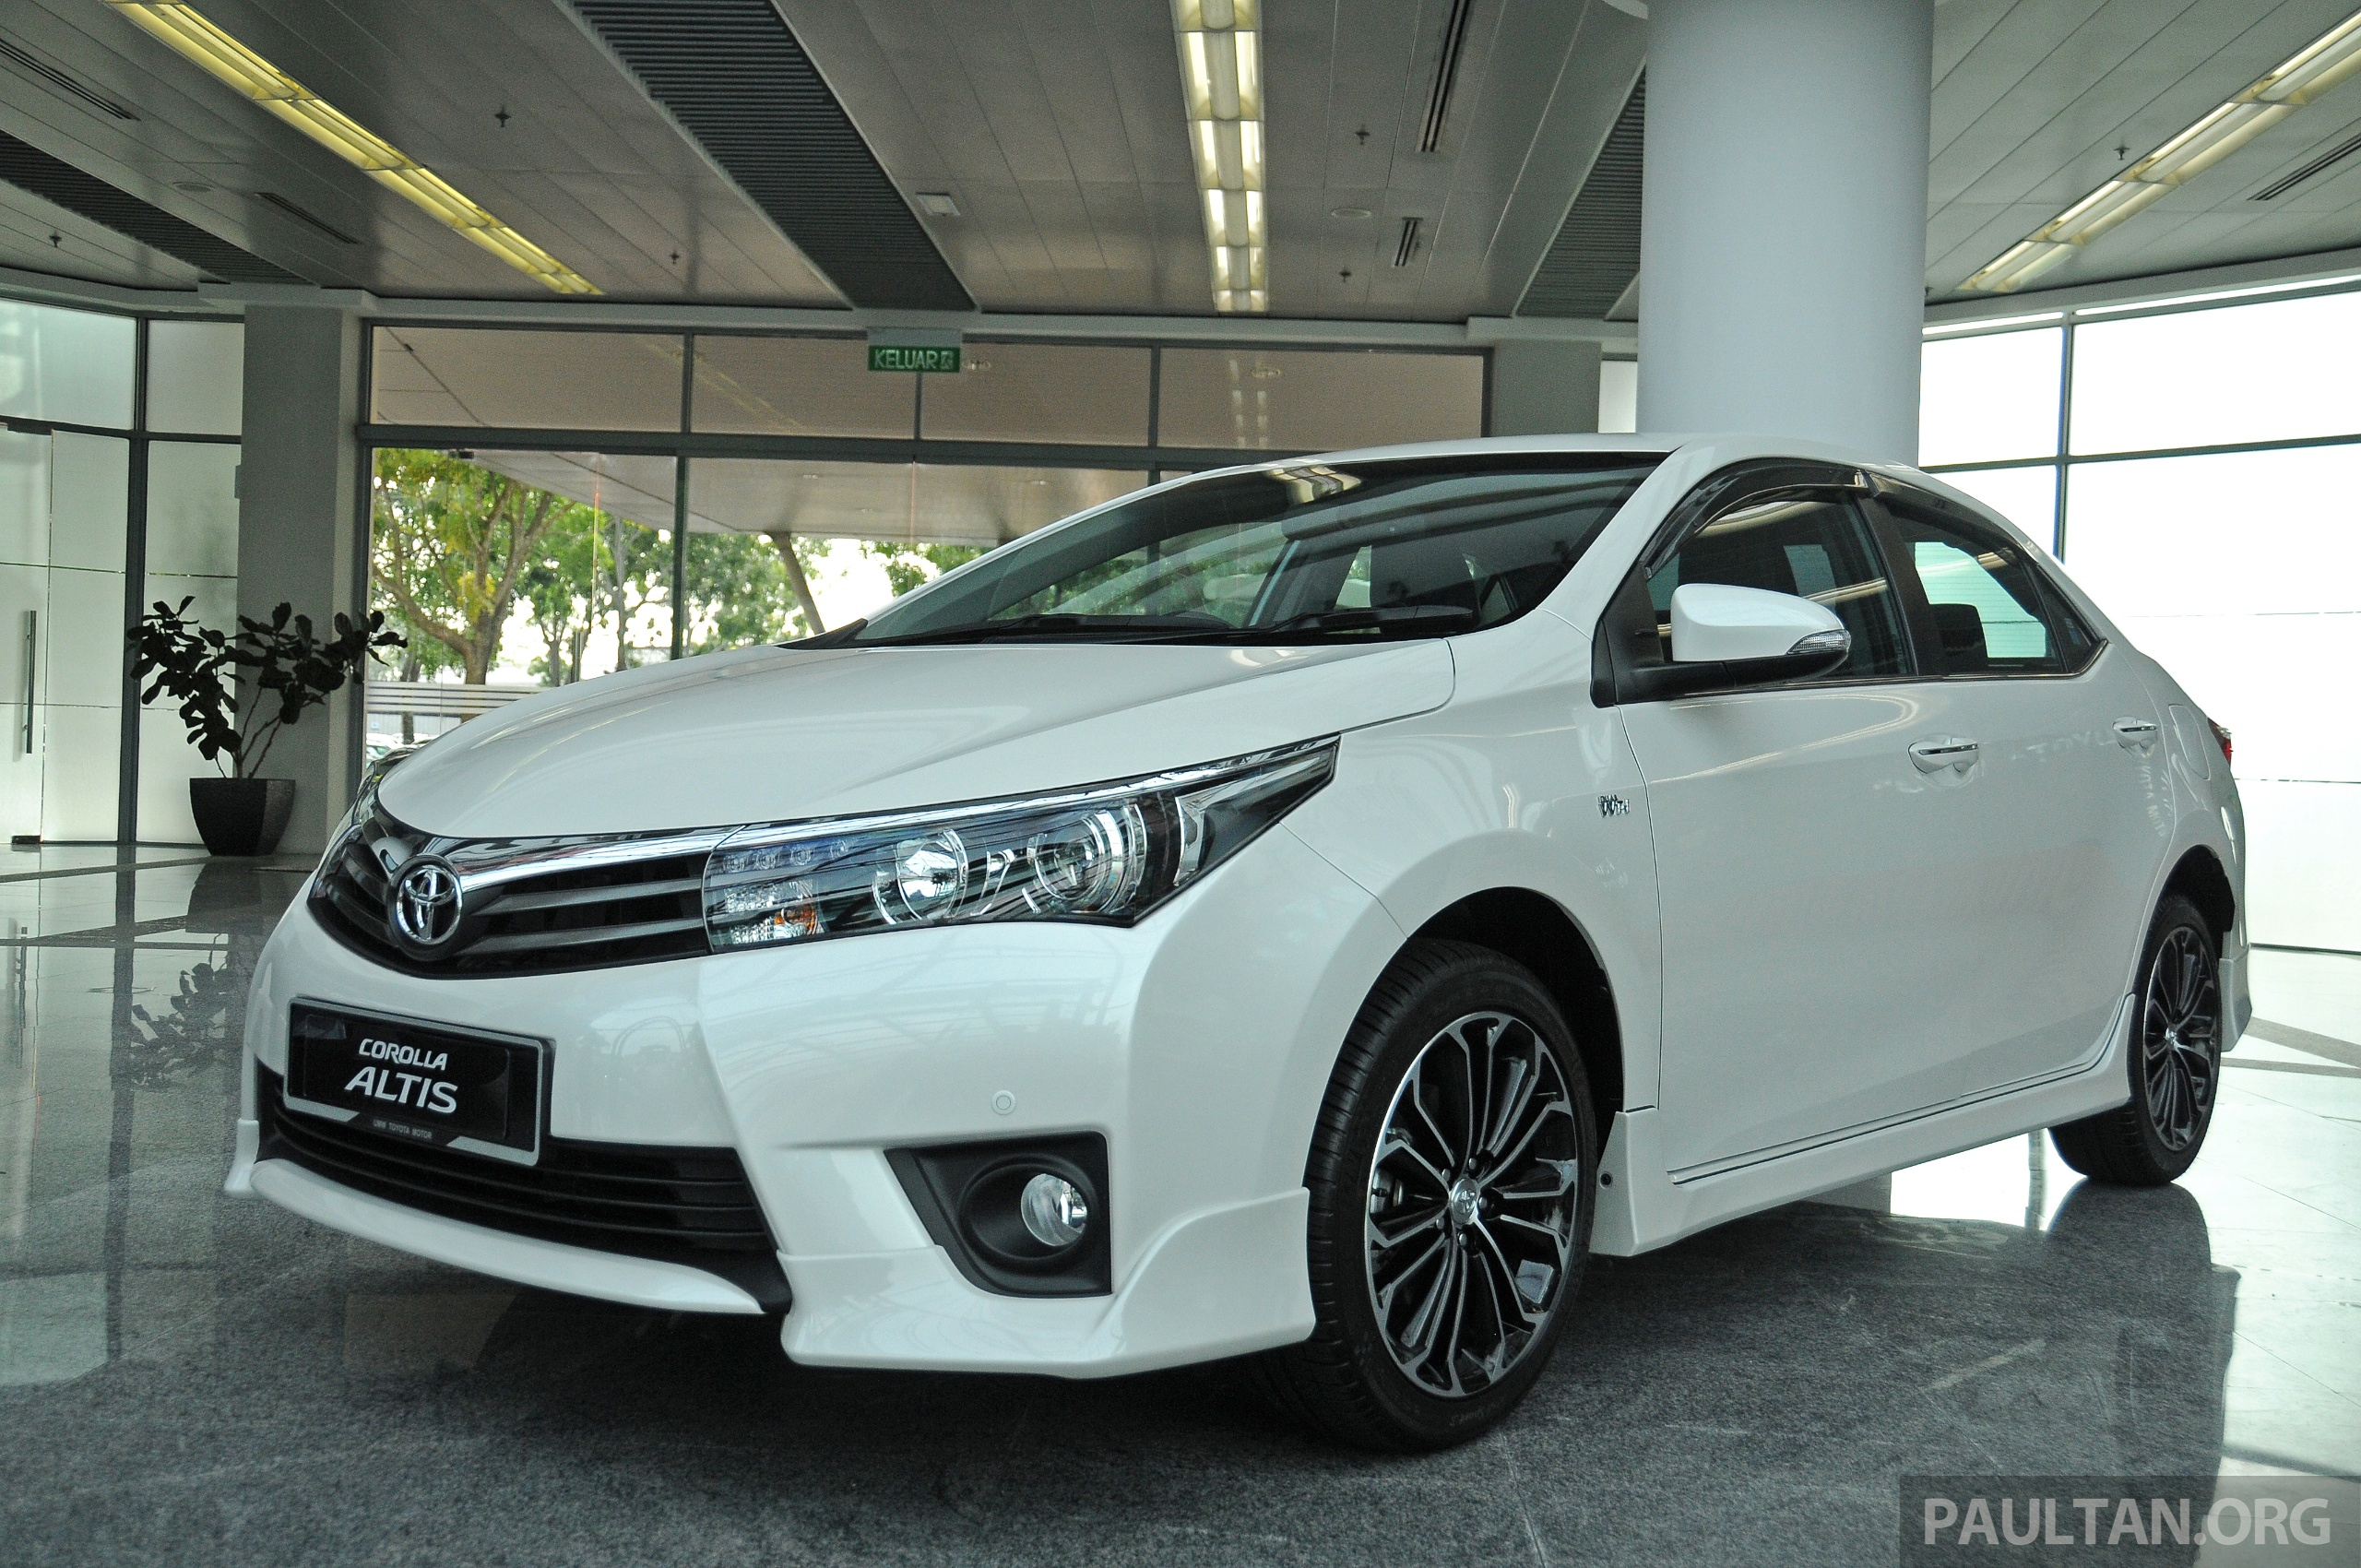 Gallery 2014 Toyota Corolla Altis Preview Pics Paul Tan